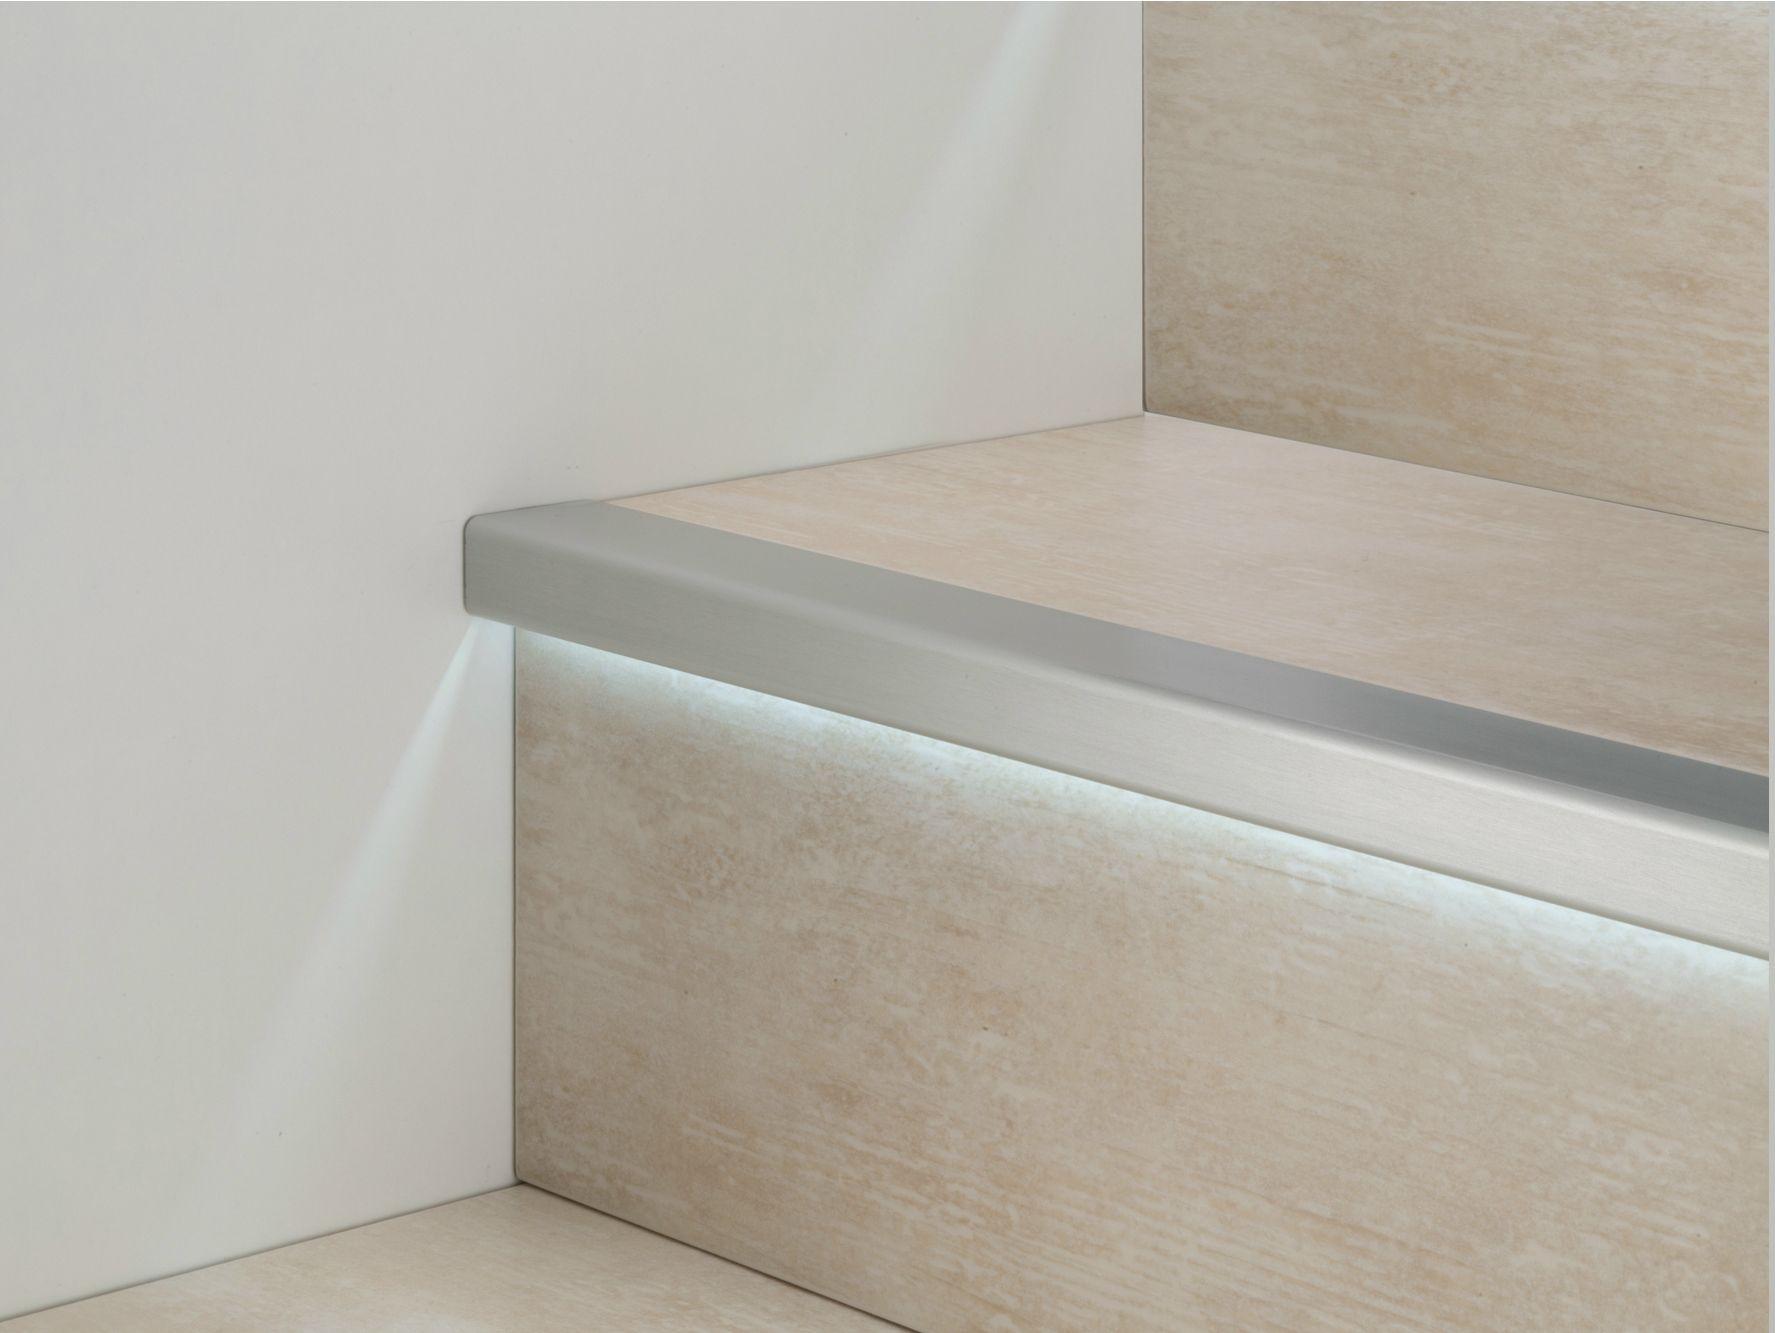 Perfiles esquineros de aluminio con led prolight prostep g for Escalera aluminio pequena